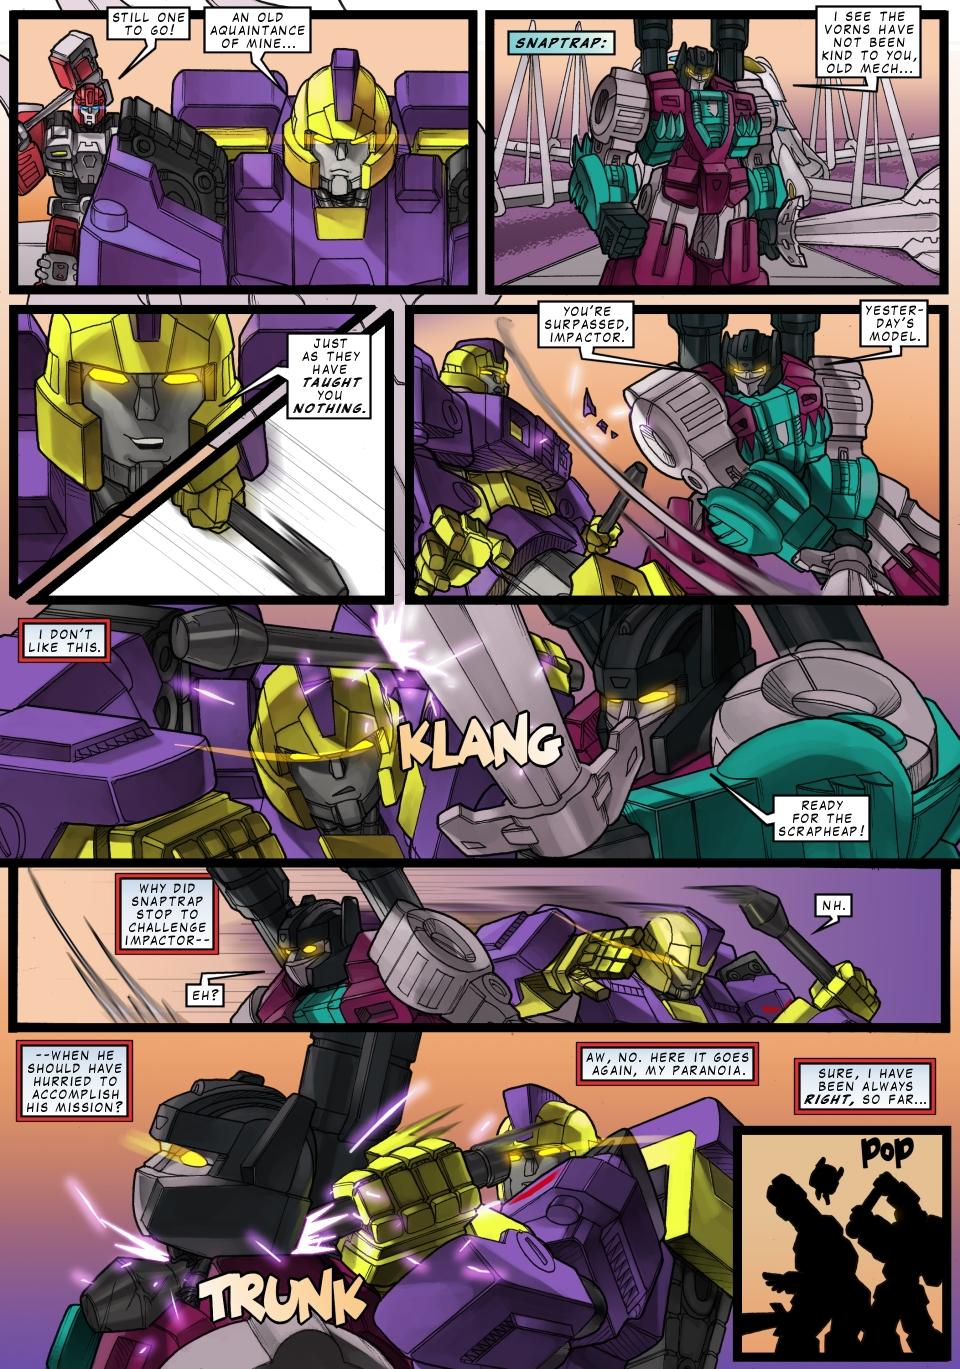 05 Magnus page 17